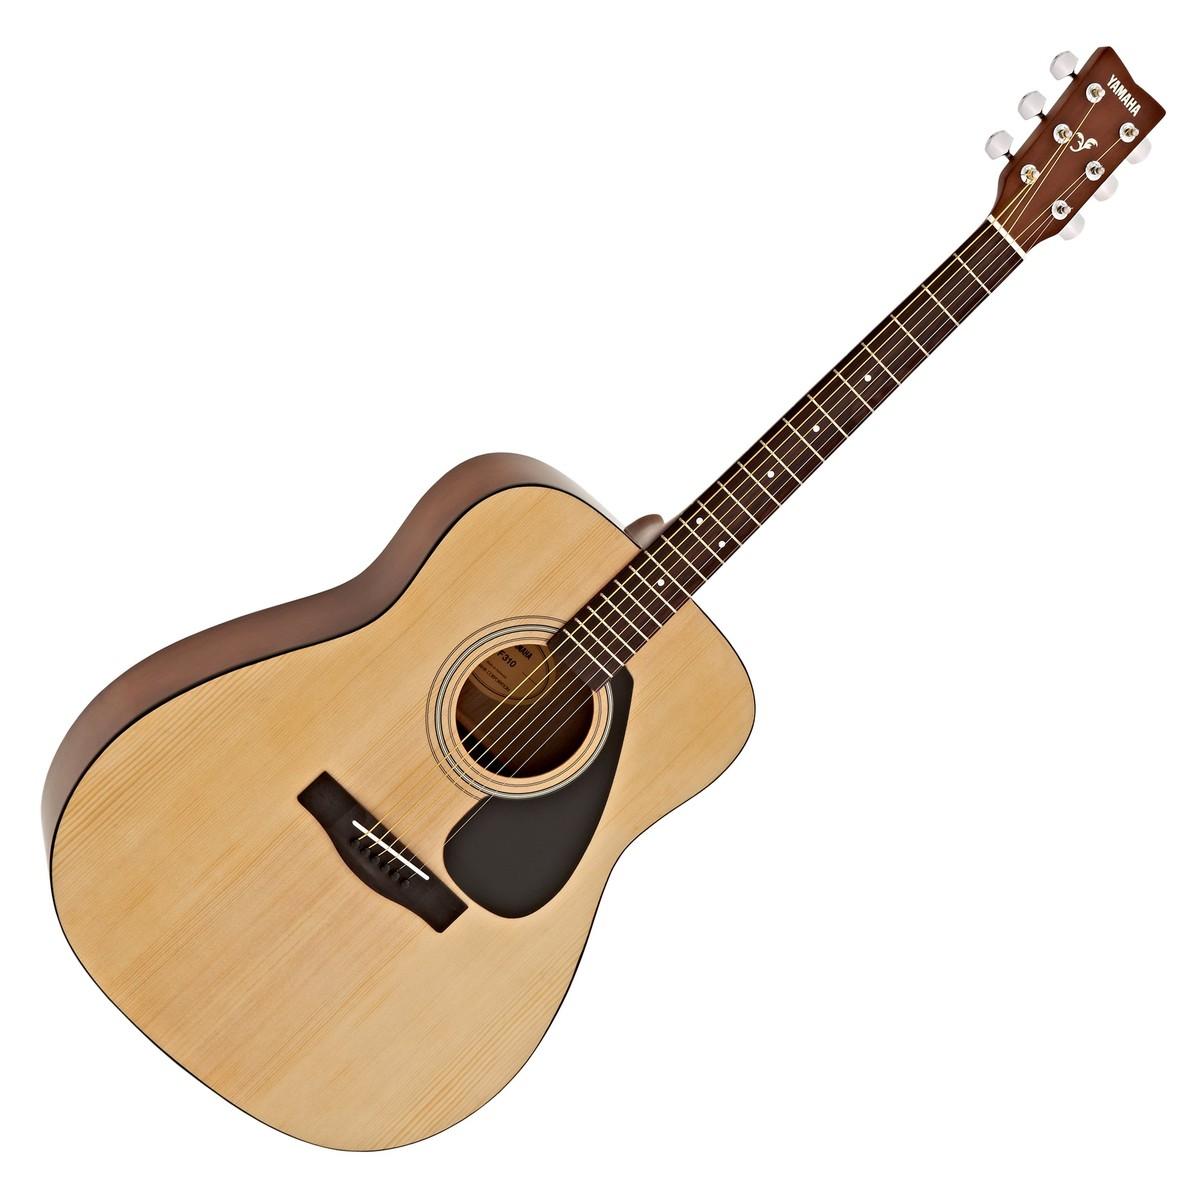 Yamaha f310p2 acoustic guitar beginners pack at for Yamaha fs 310 guitar